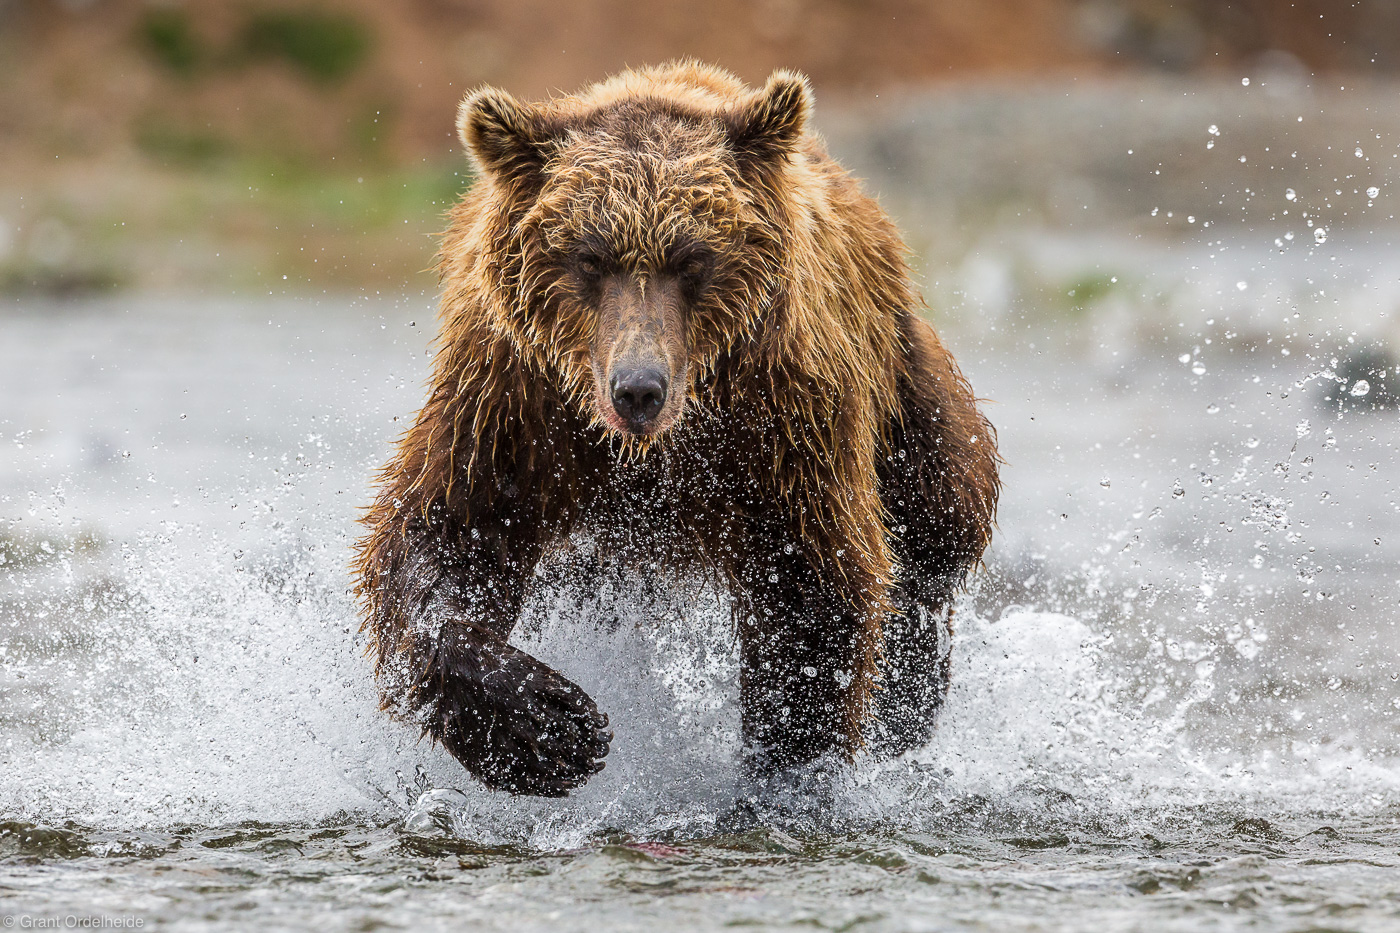 alaska, bear, brown, katmai, naitonal park, usa, hunting, salmon, preserve, sockeye